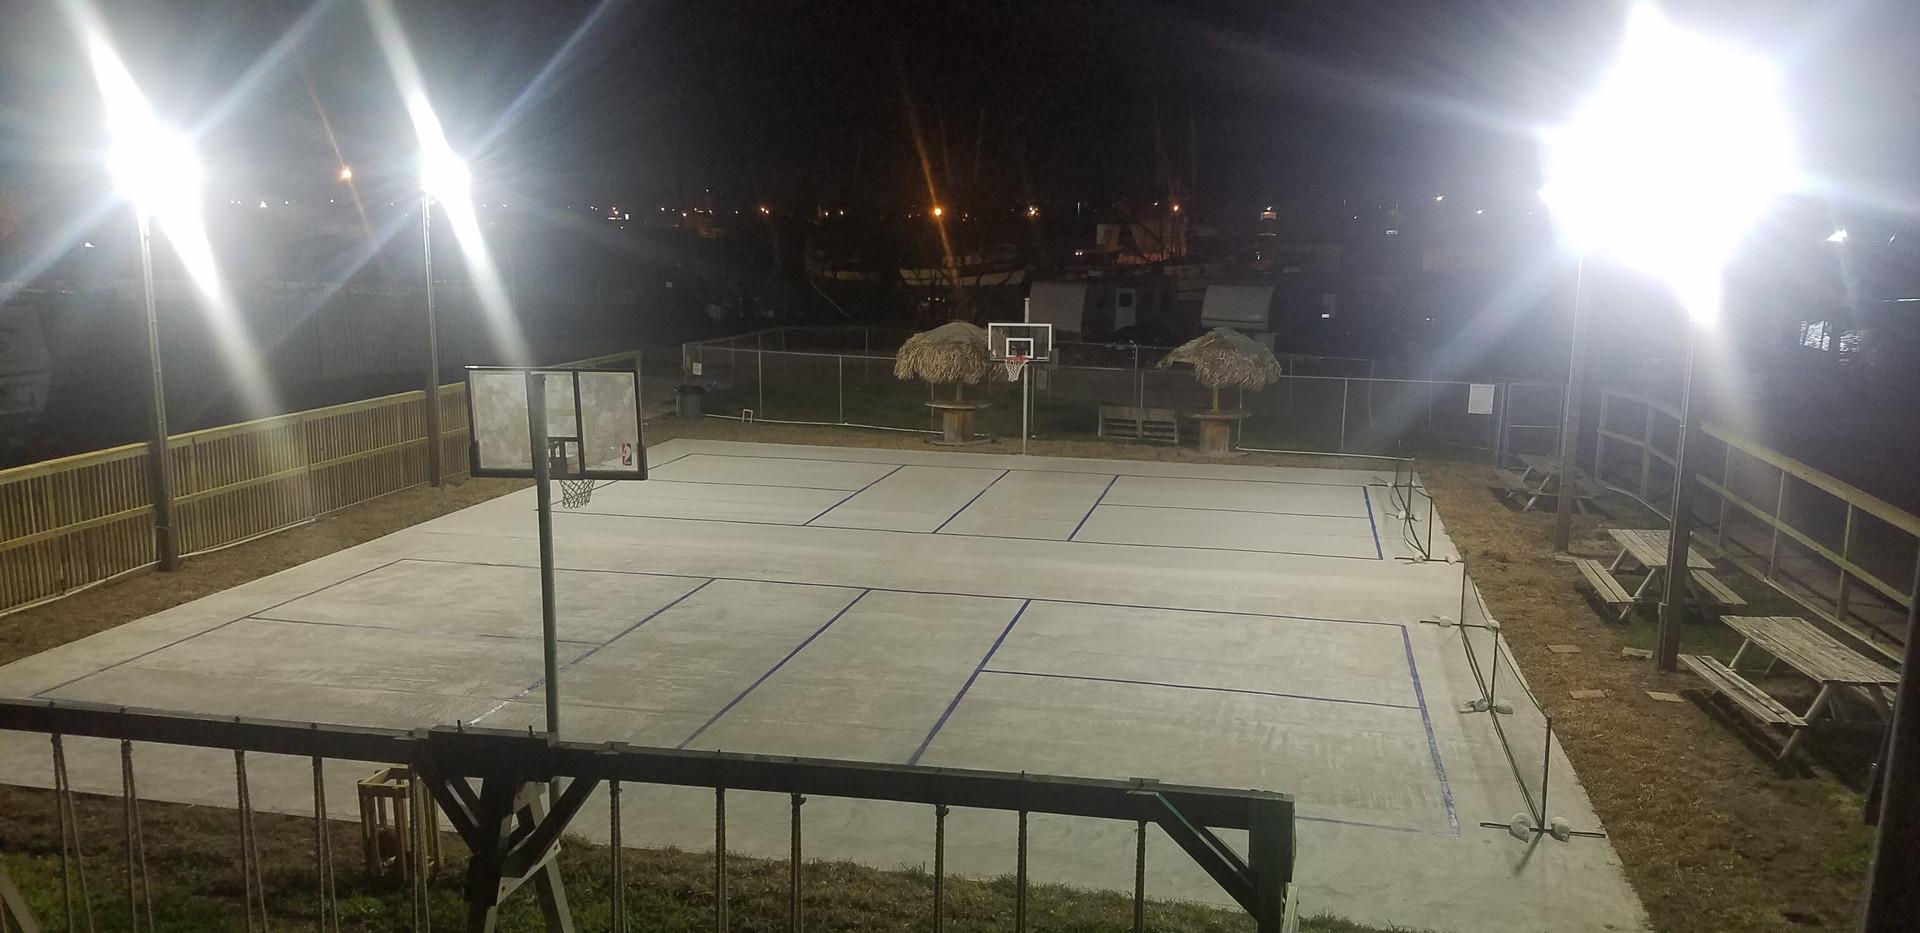 Basketball Court at Night